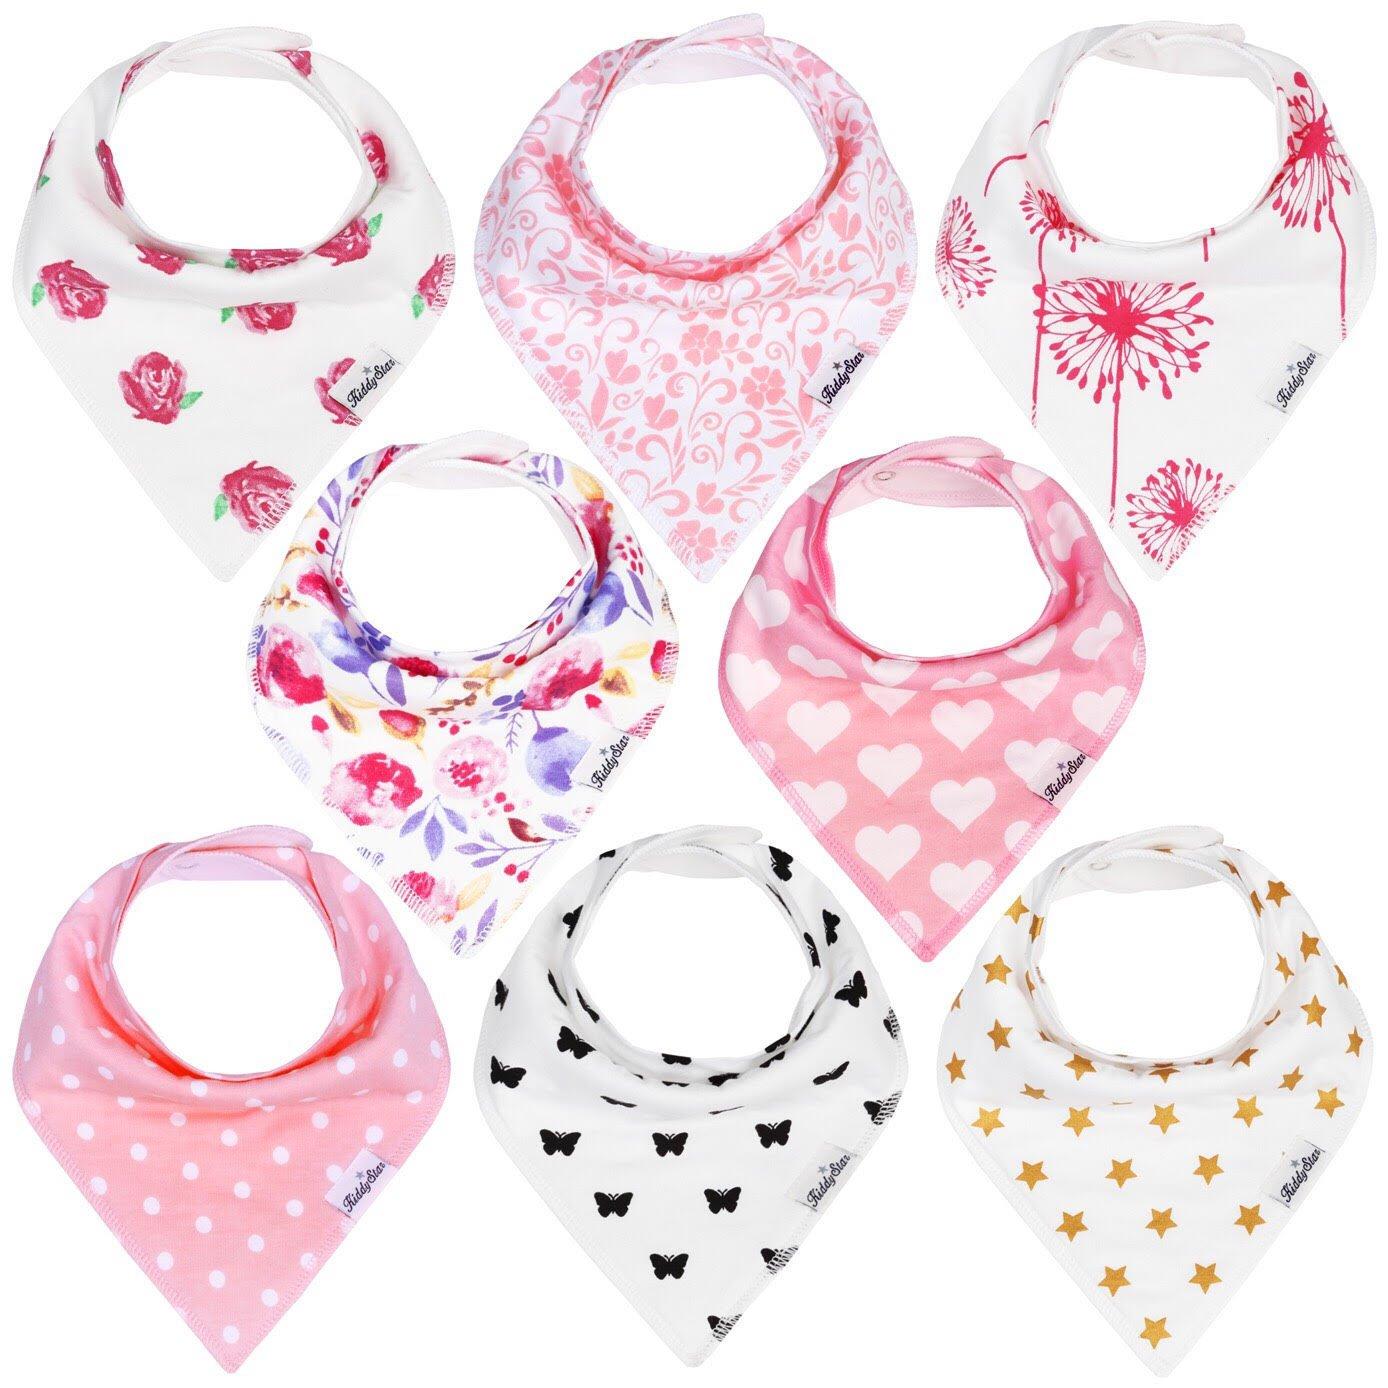 f6df4a2c9f47 Amazon.com   KiddyStar Bandana Baby Drool Bibs for Girls